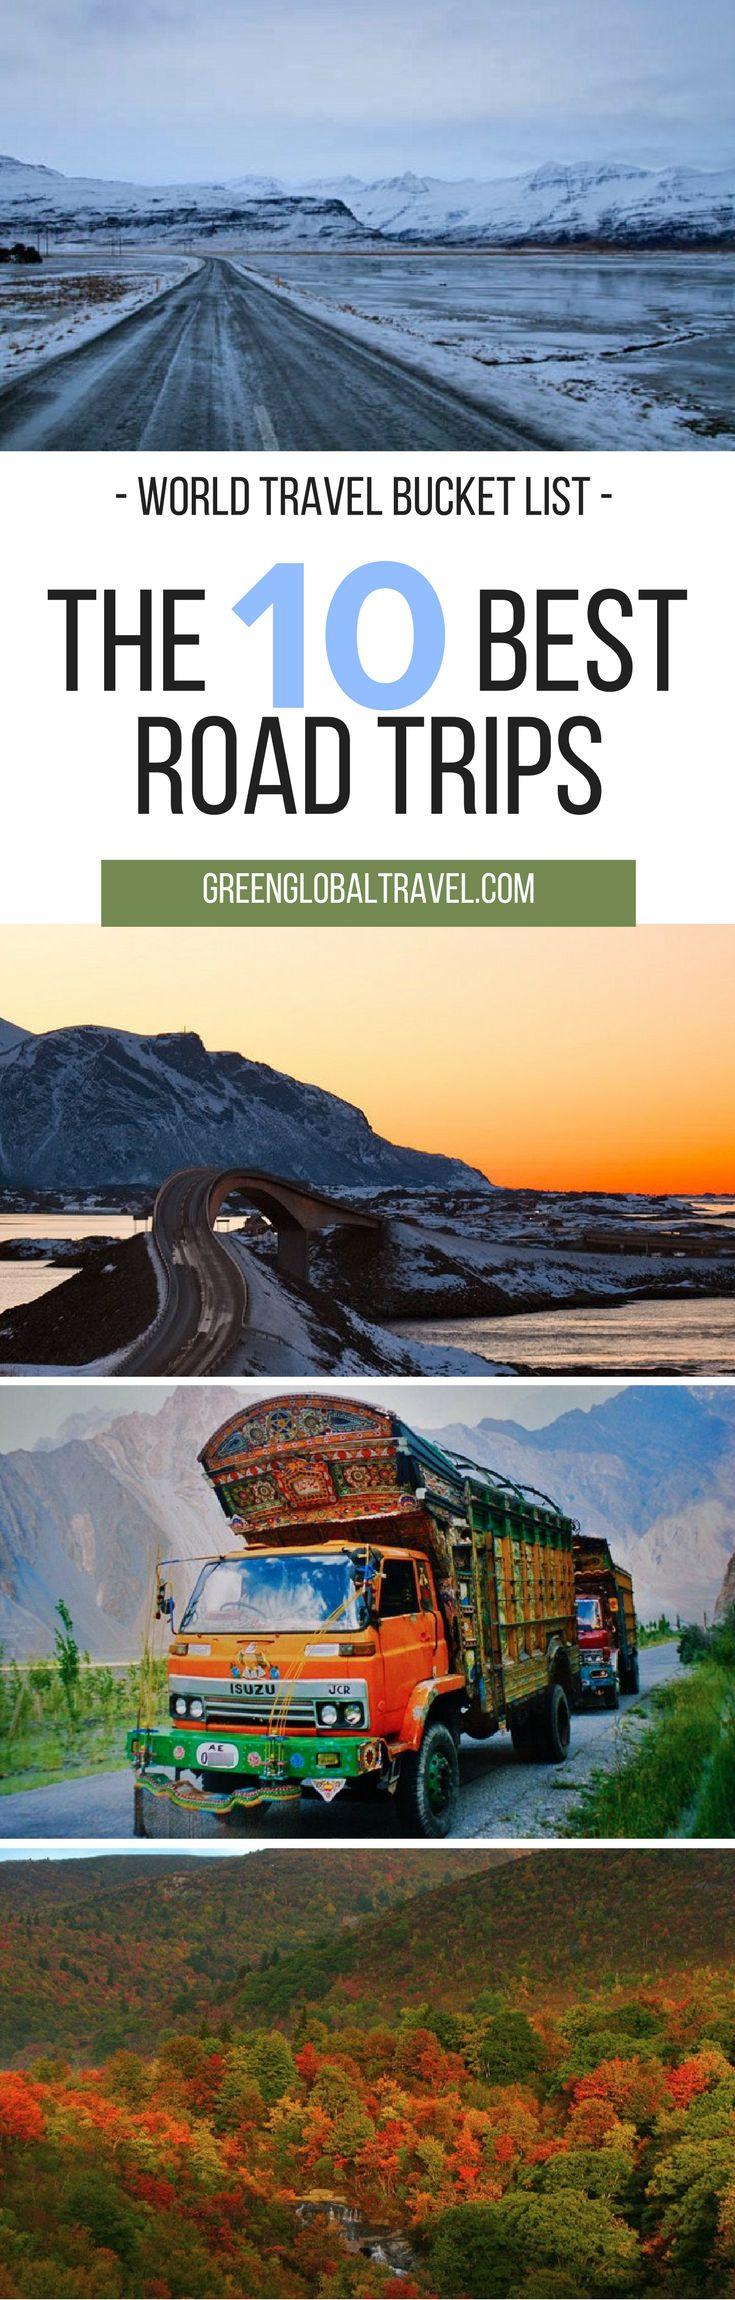 Here are ten road trips for your world travel bucket list!   Norway   Spain   France   North Carolina   Virginia   Alaska   Australia   China   Pakistan   South America   Iceland   Namibia   New Zealand  